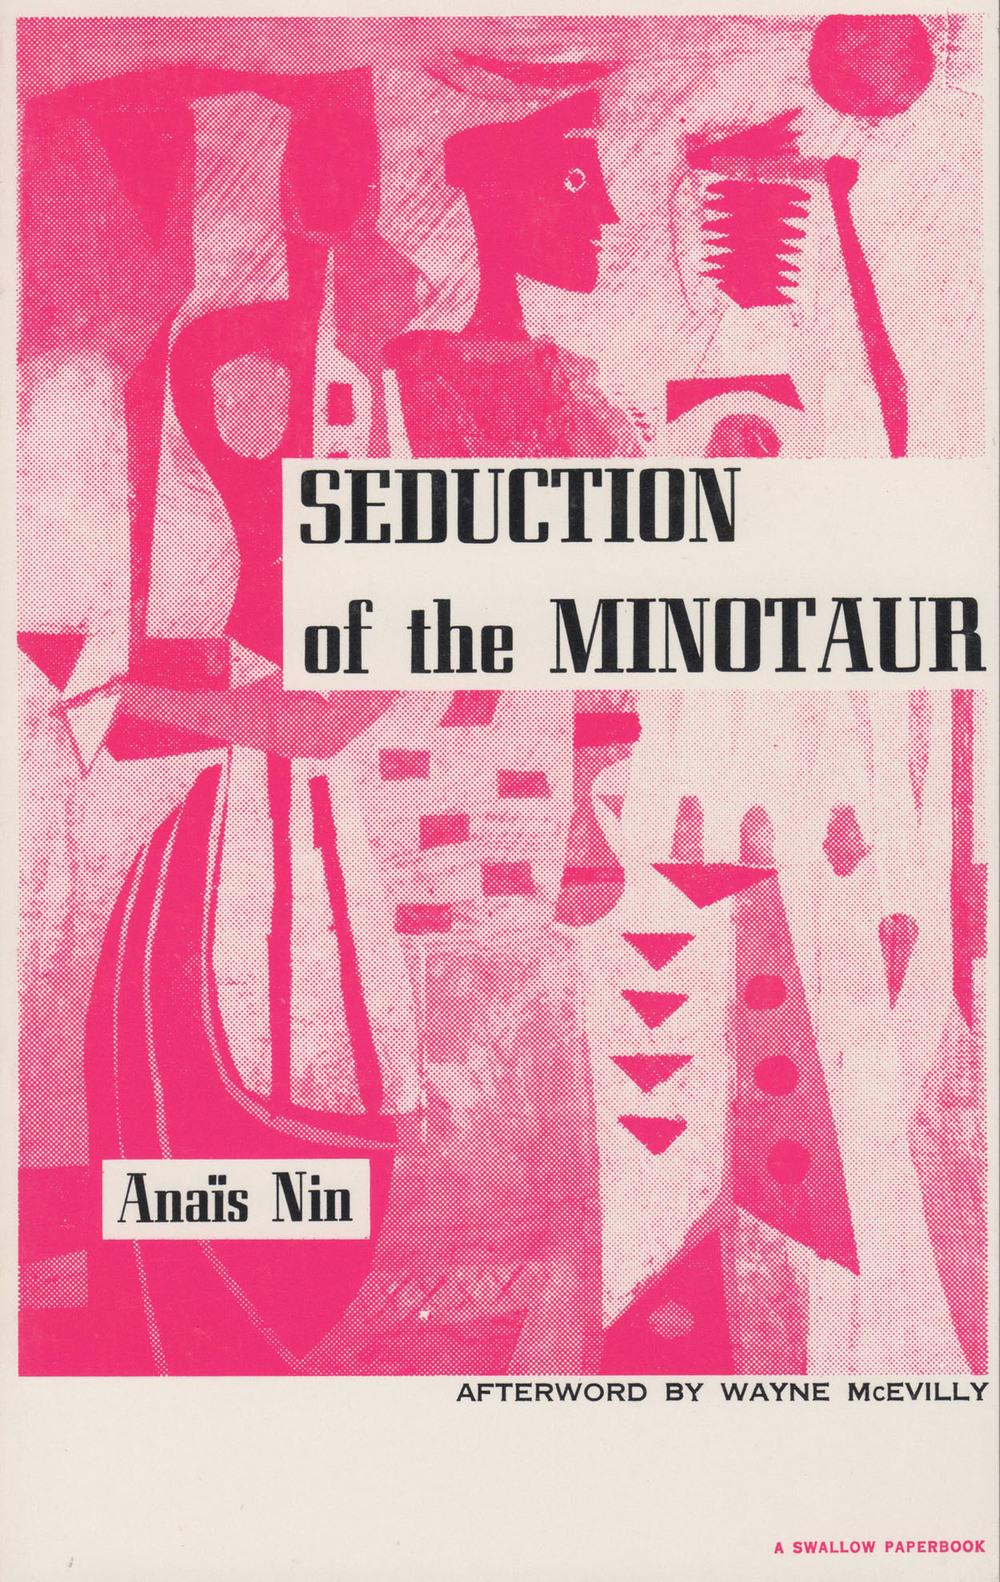 10083 Minotaur pink.jpg